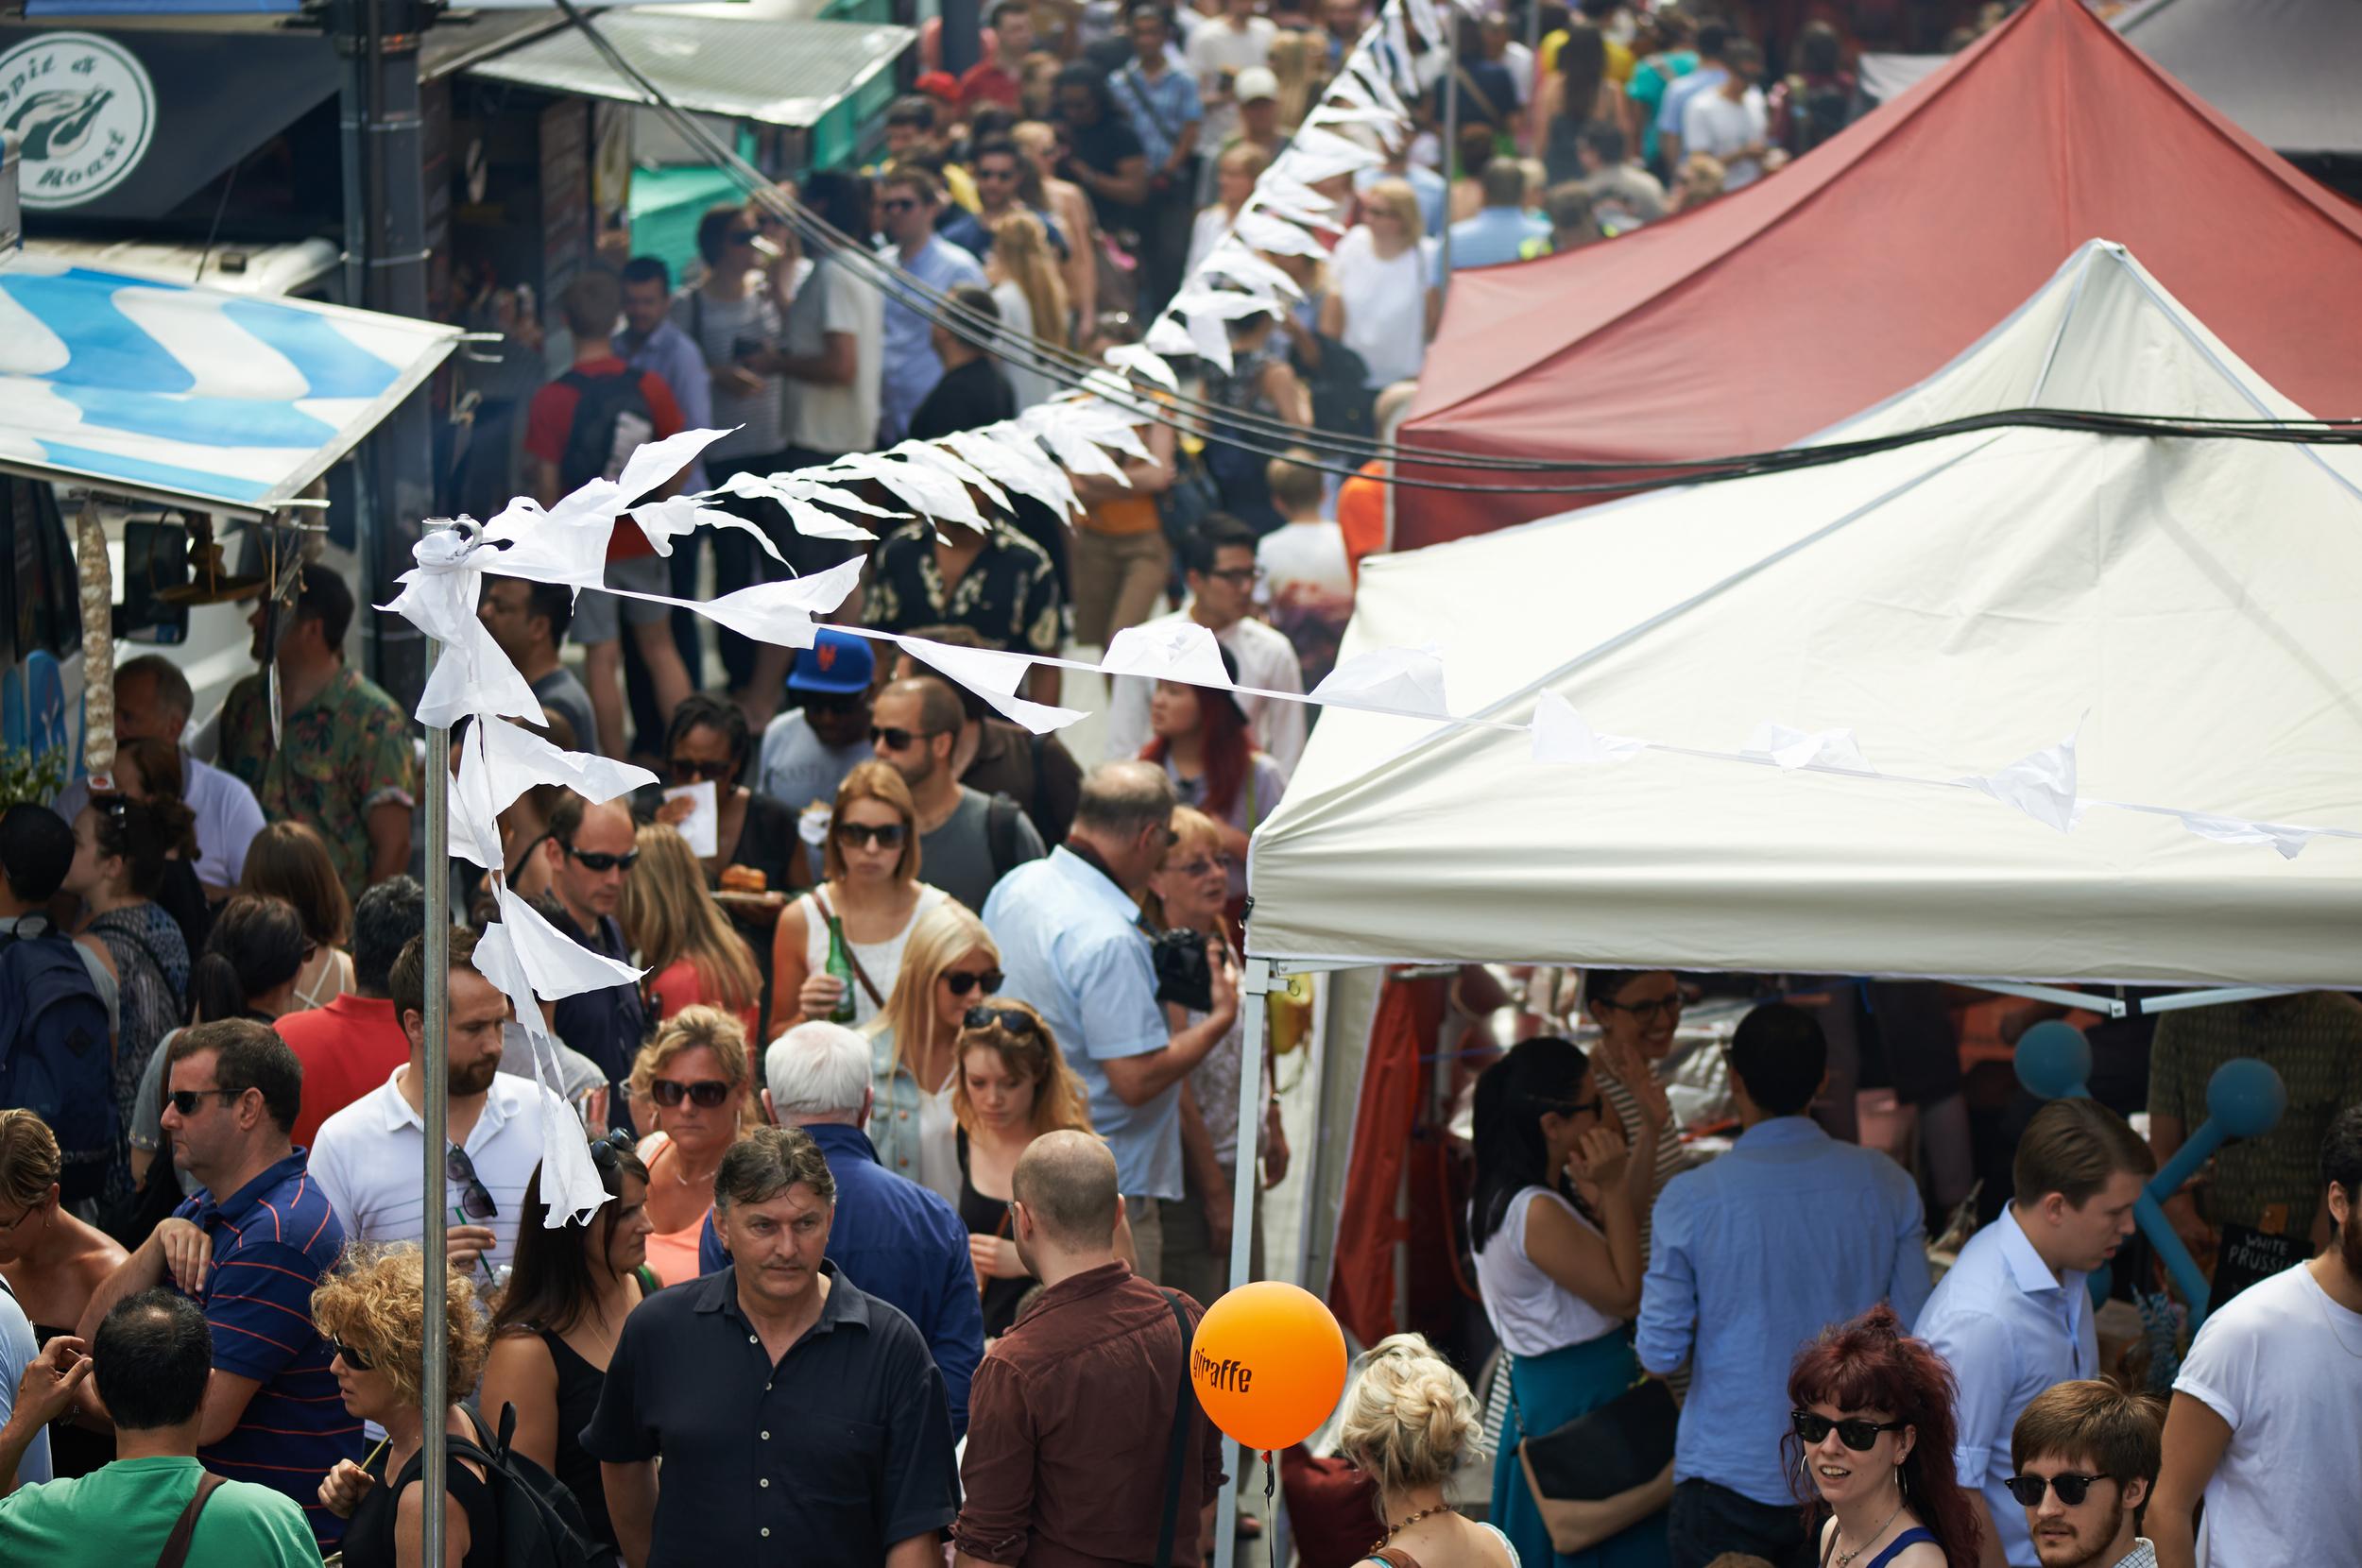 image of street food market in London